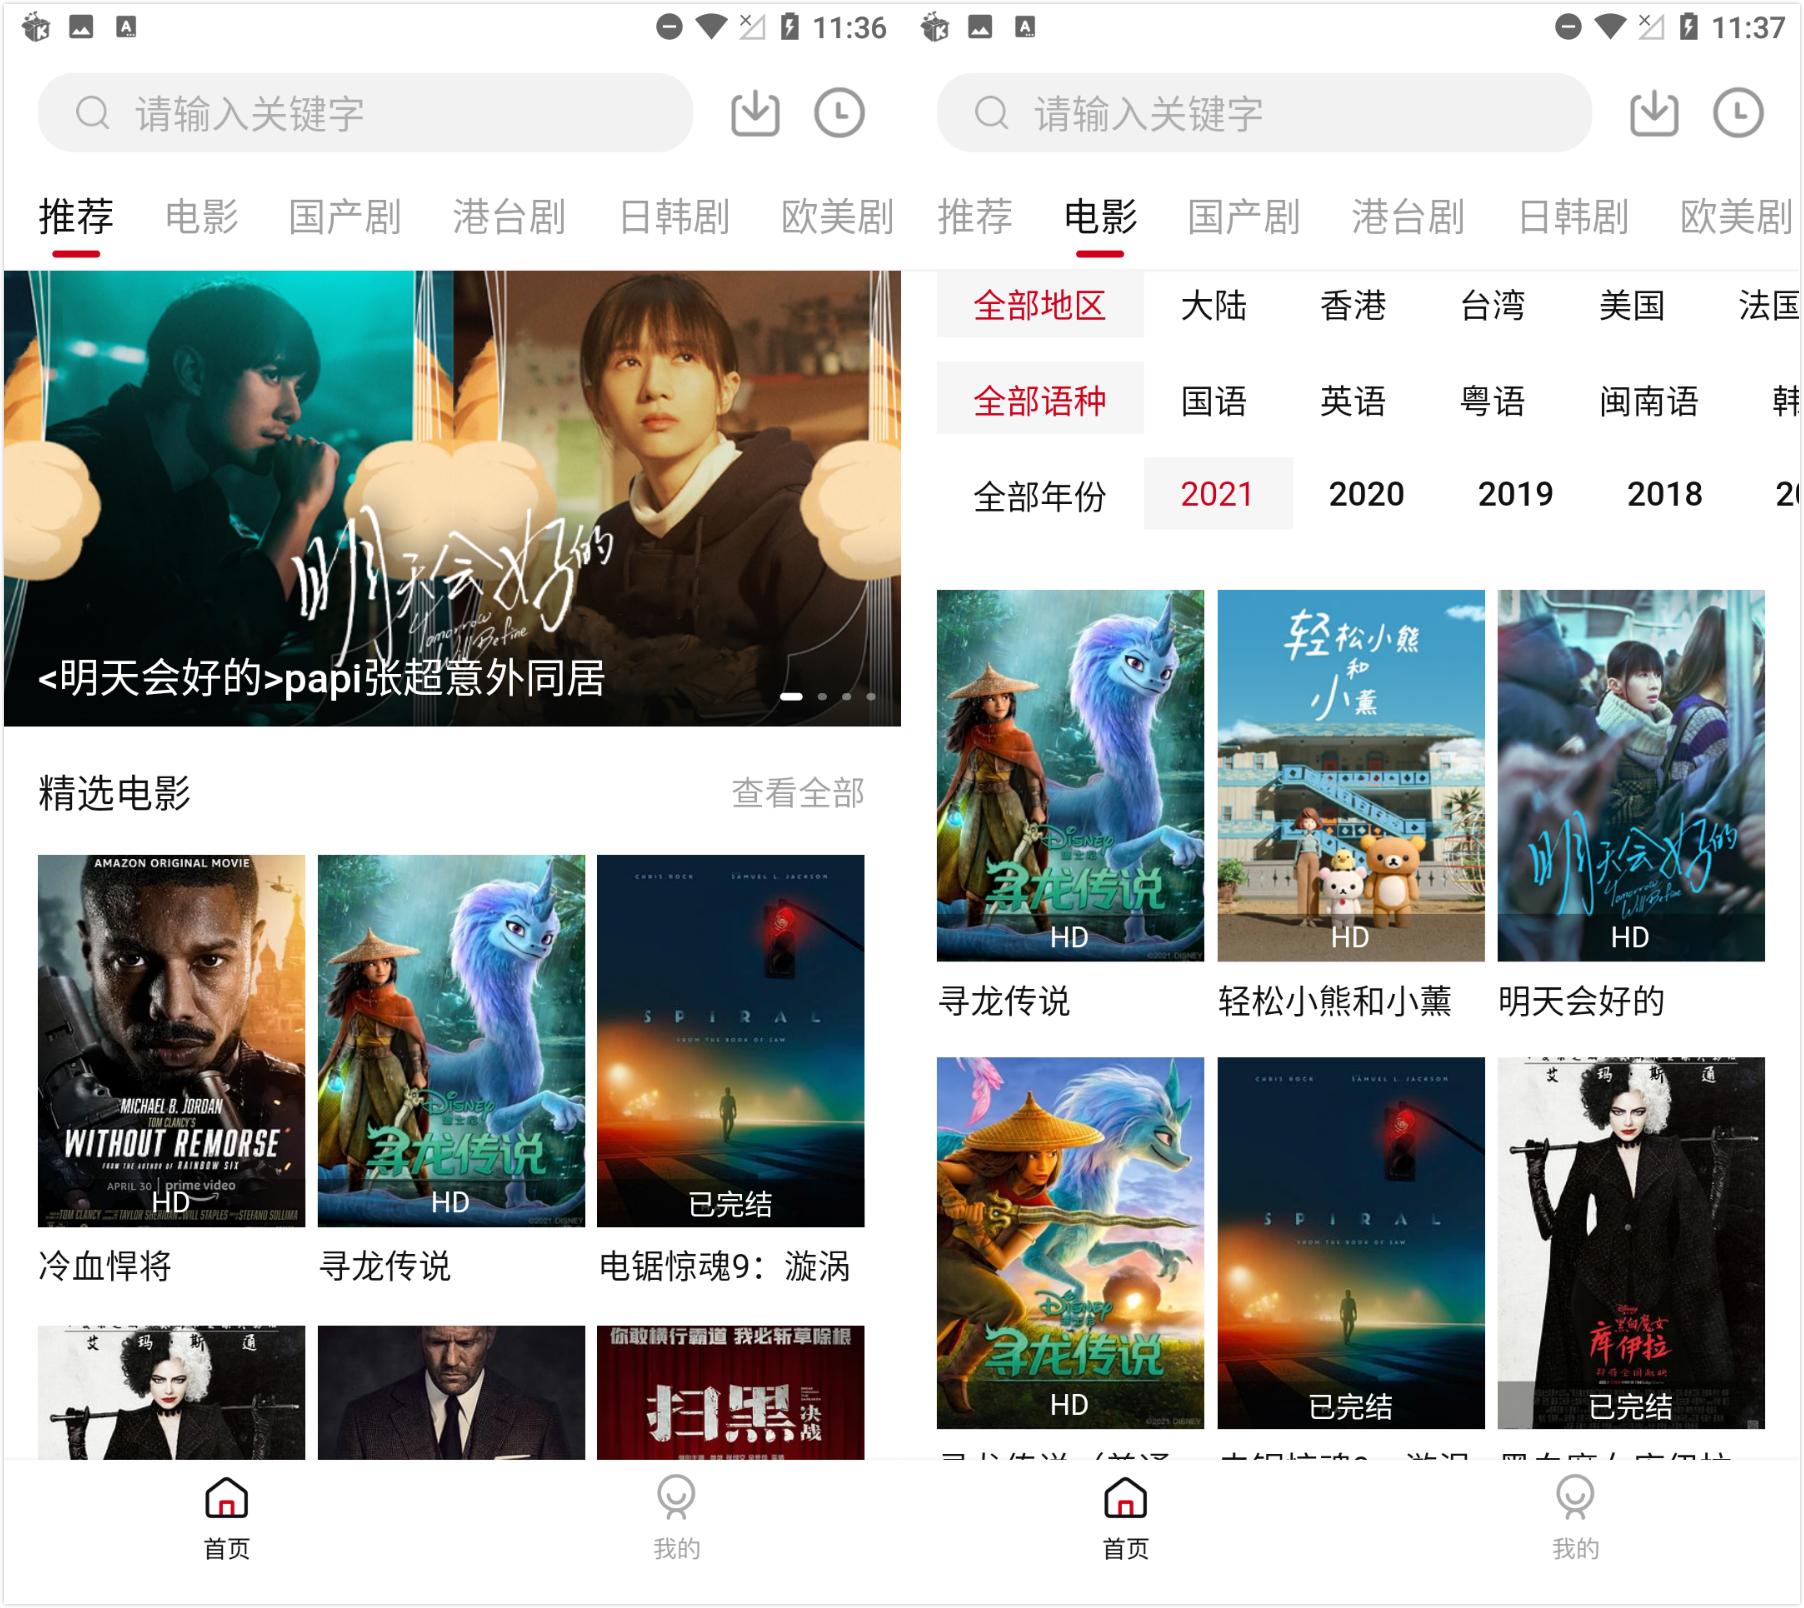 软件推荐[Android]毒舌电影 v1.7.1 安卓版